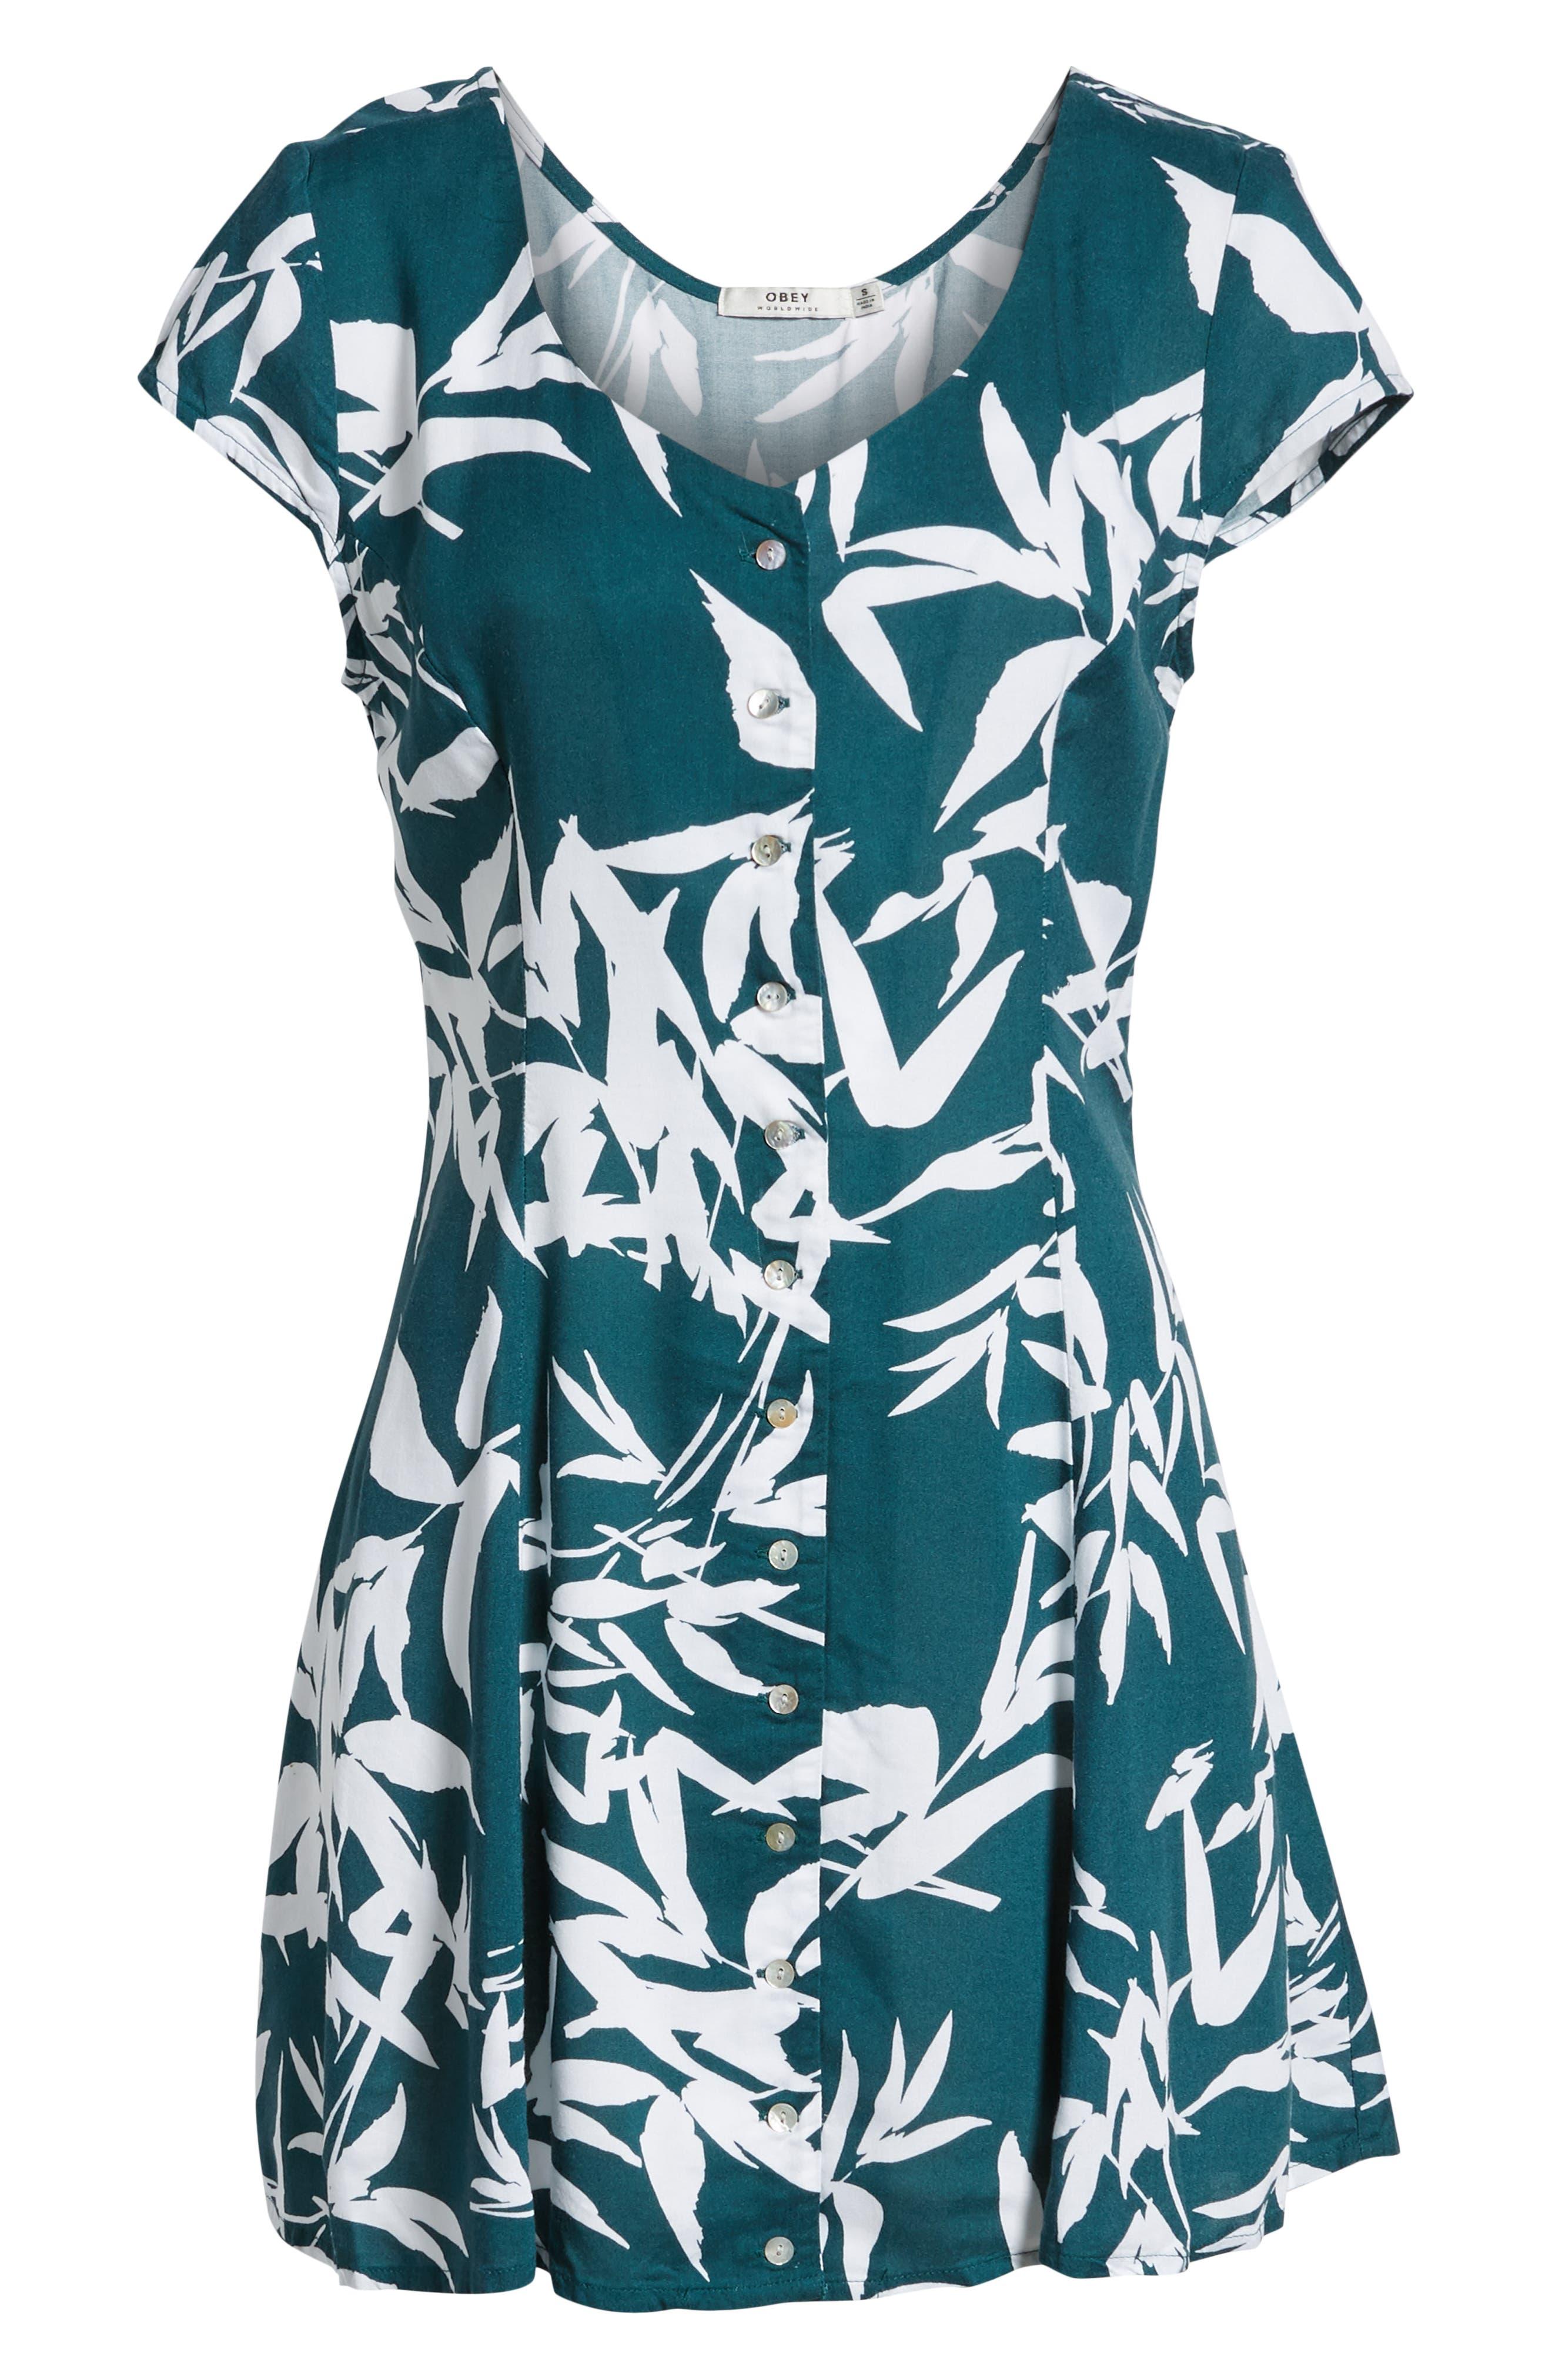 Calico Leaf Print Dress,                             Alternate thumbnail 7, color,                             Spruce Multi